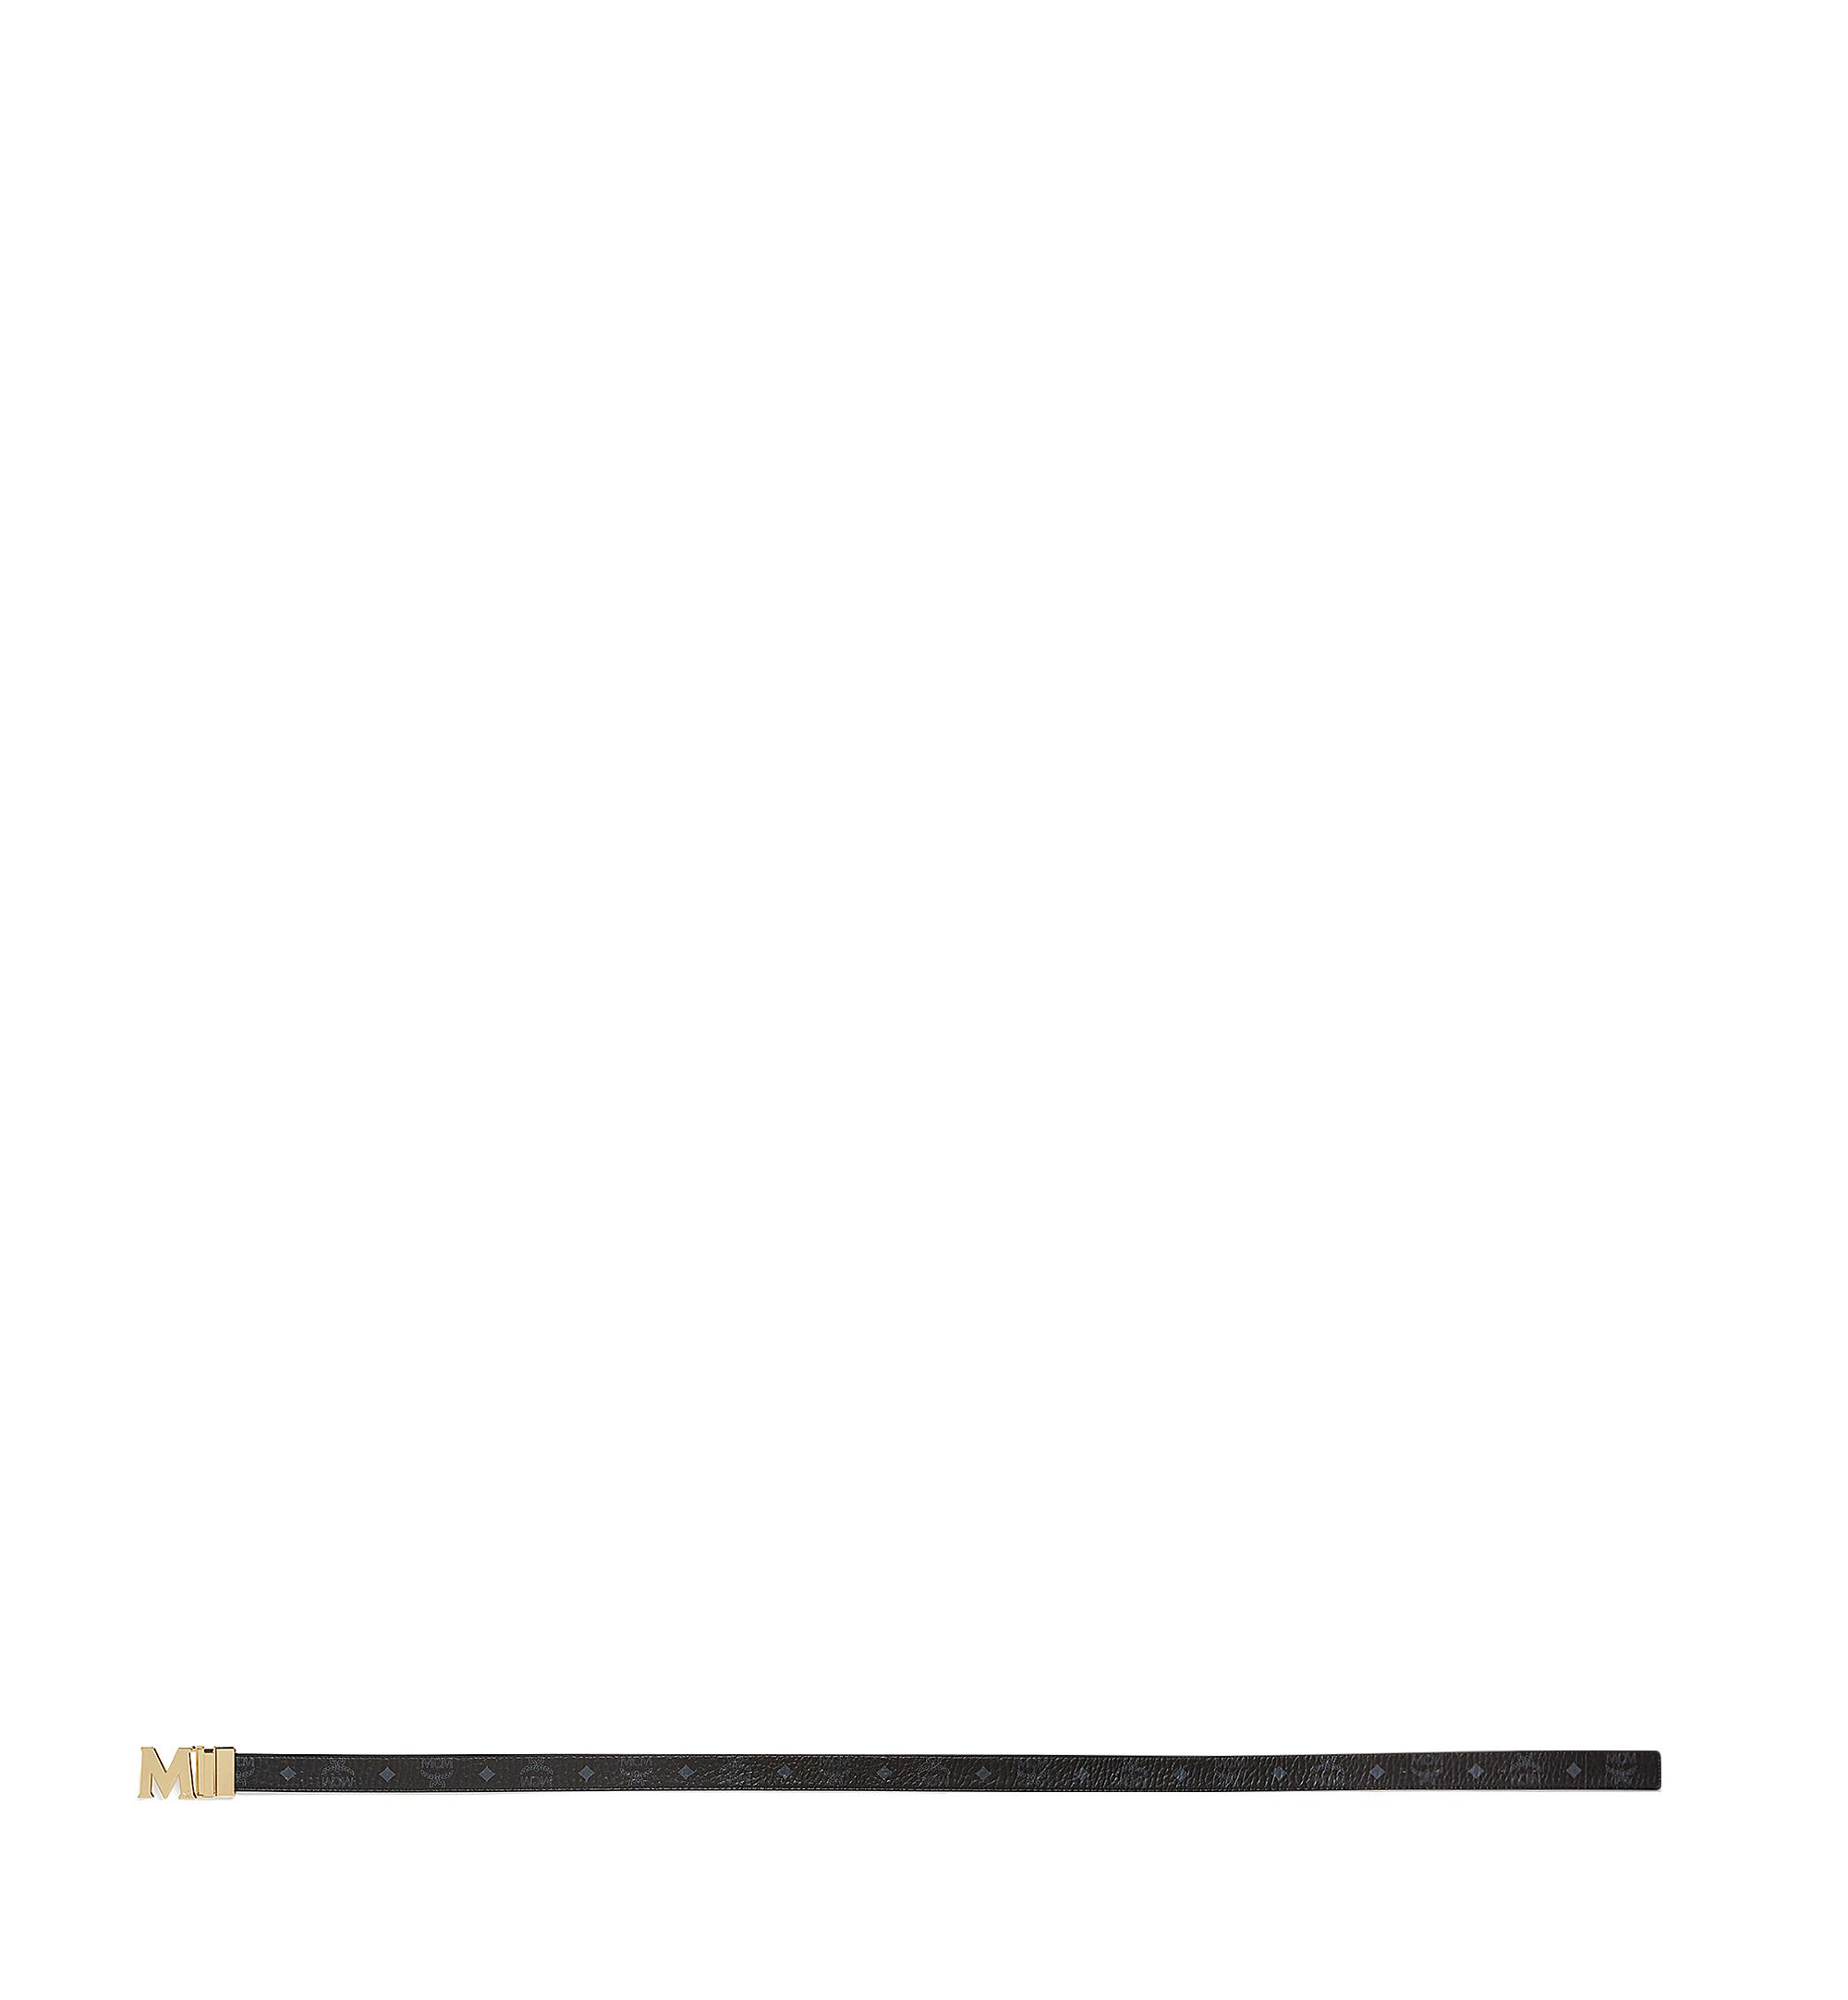 MCM Claus M Reversible Belt 3 cm in Visetos Black MYB7SVC09BK001 Alternate View 2